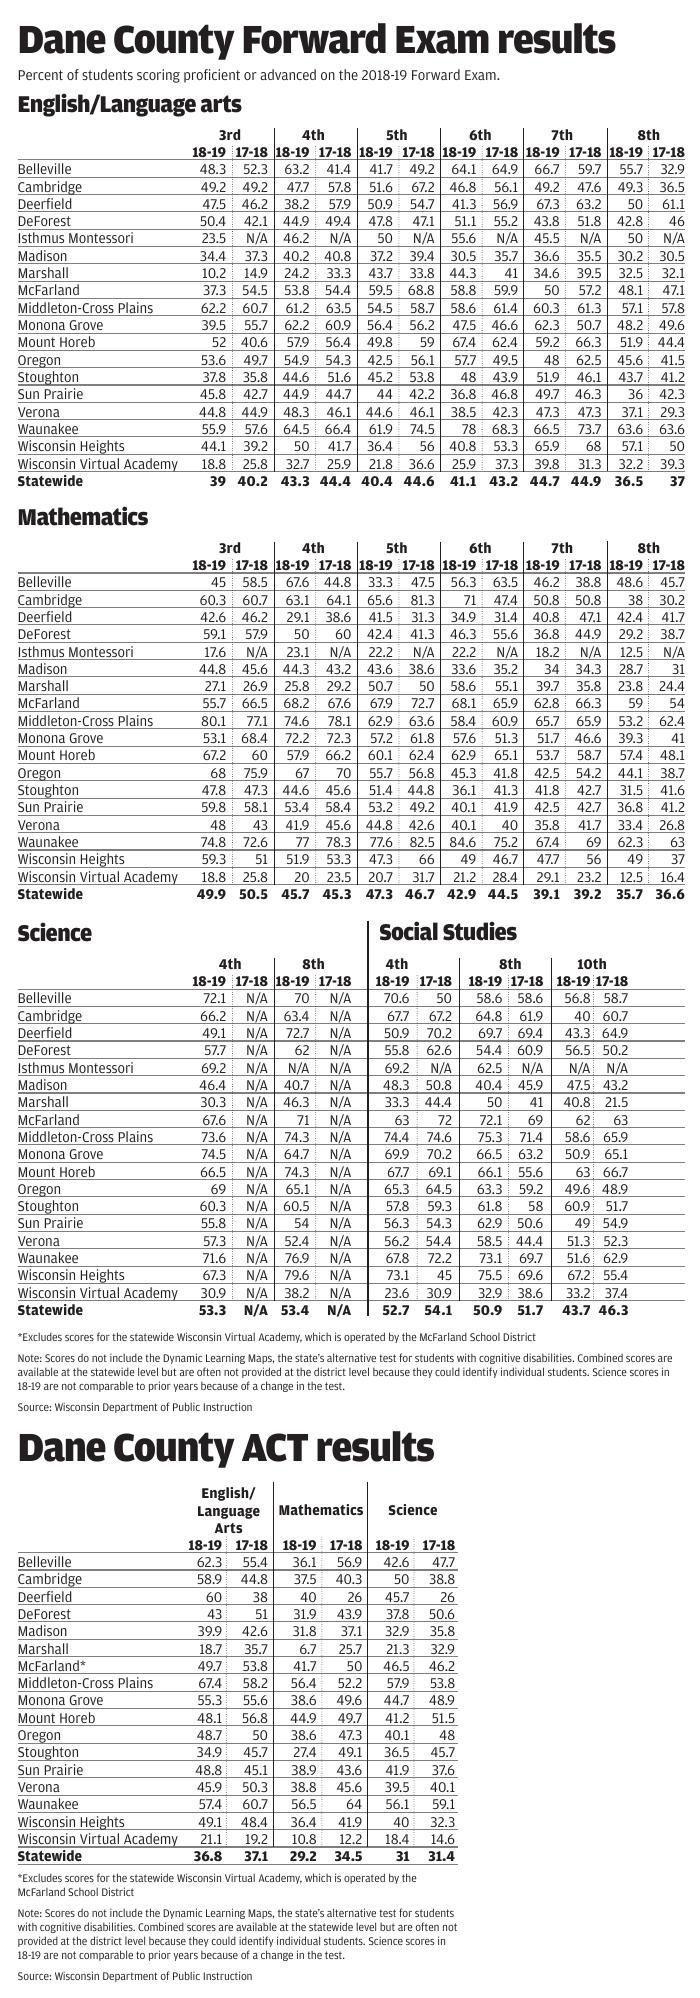 Forward/ACT exam results 2019